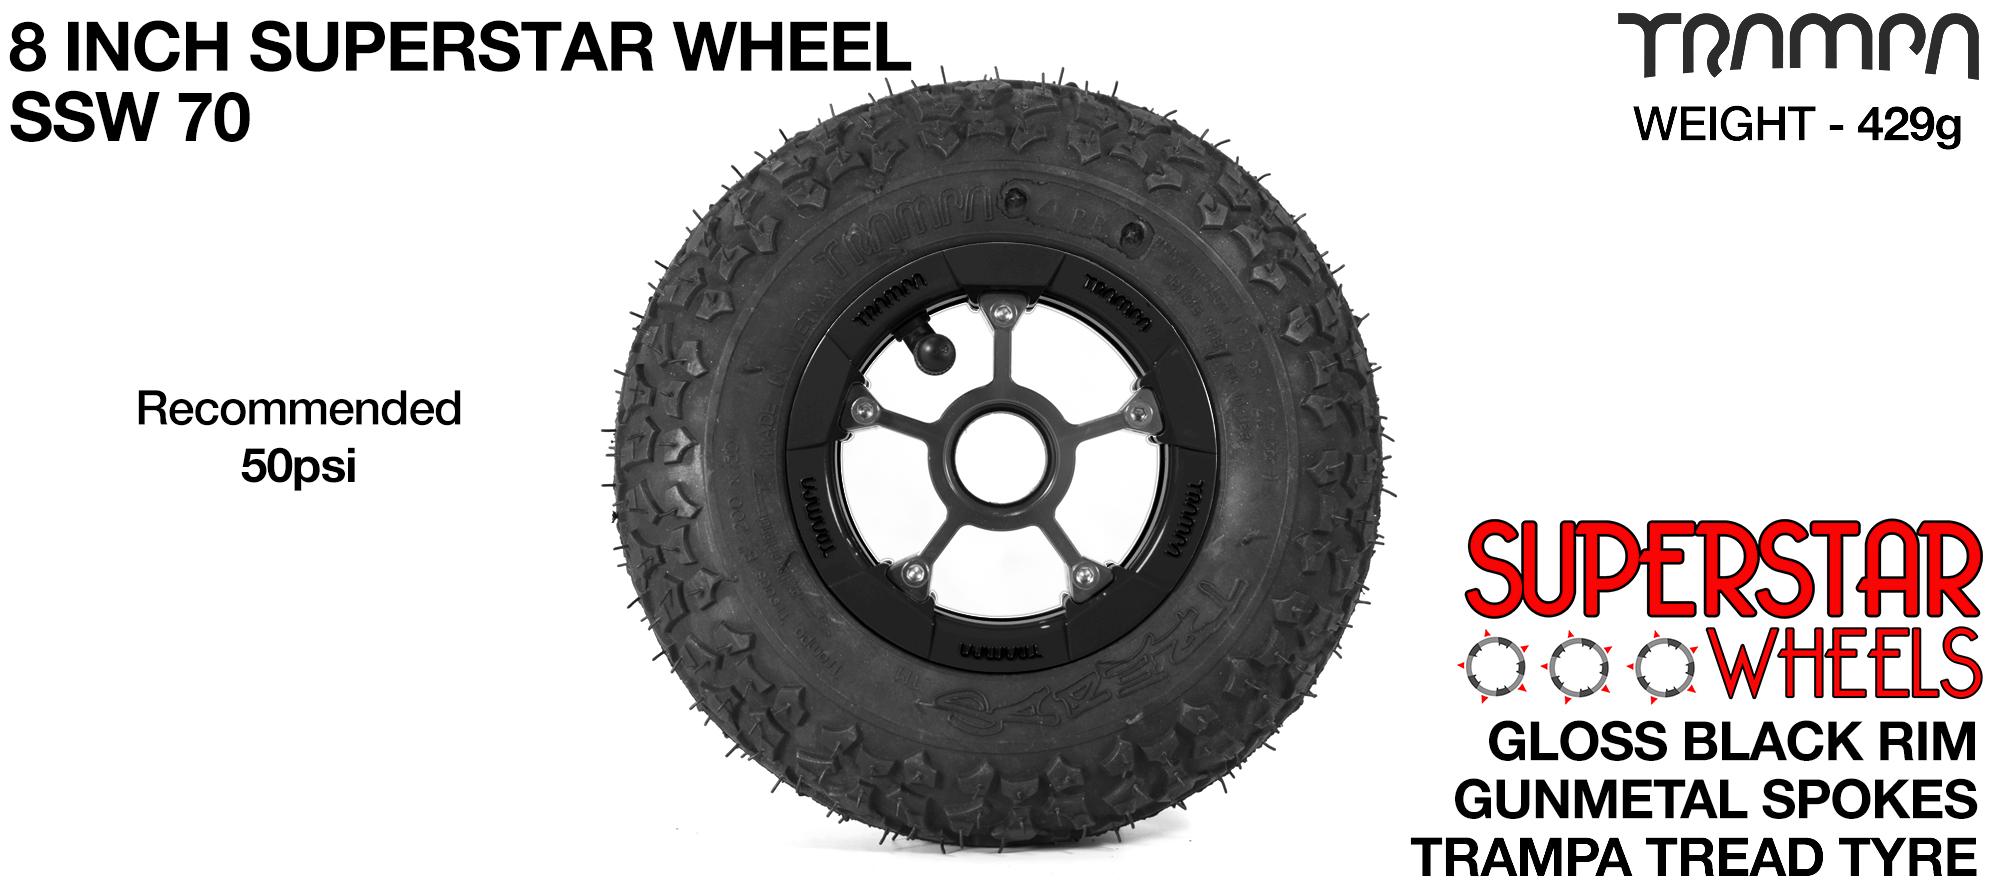 Superstar 8 inch wheel - Black Gloss Rim with Gunmetal Anodised spokes & TRAMPA TREAD 8 Inch Tyres